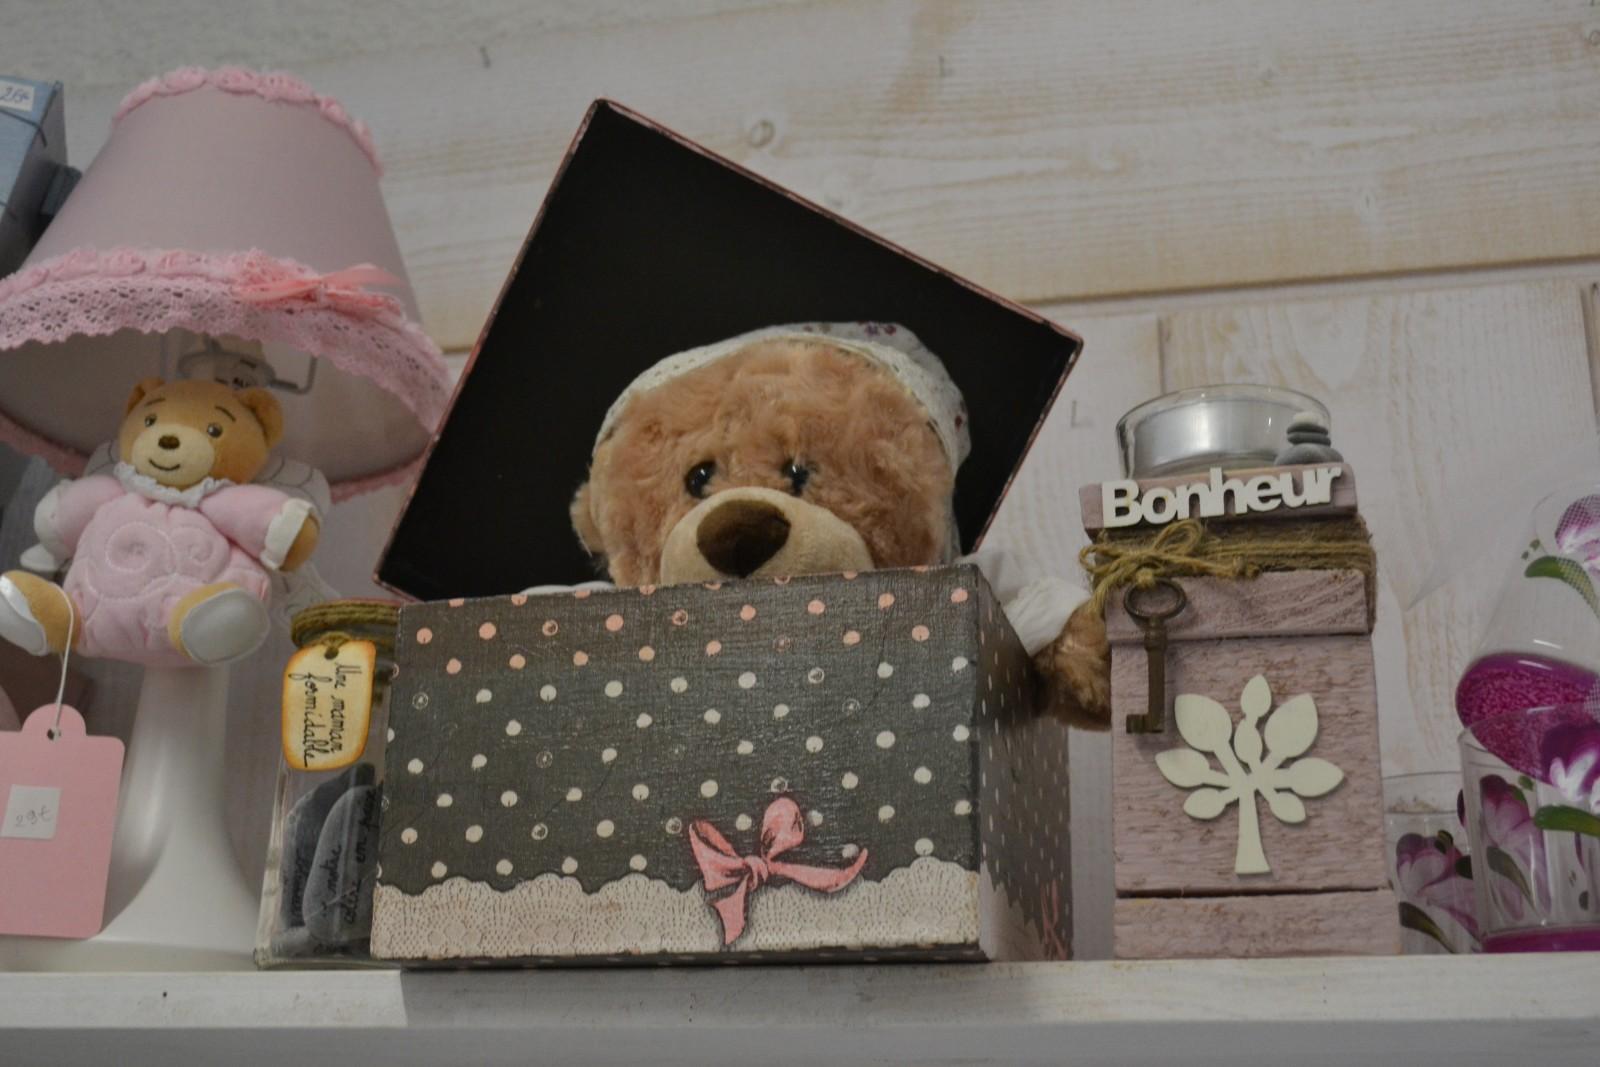 Cet ours en peluche attend une famille. ©MD